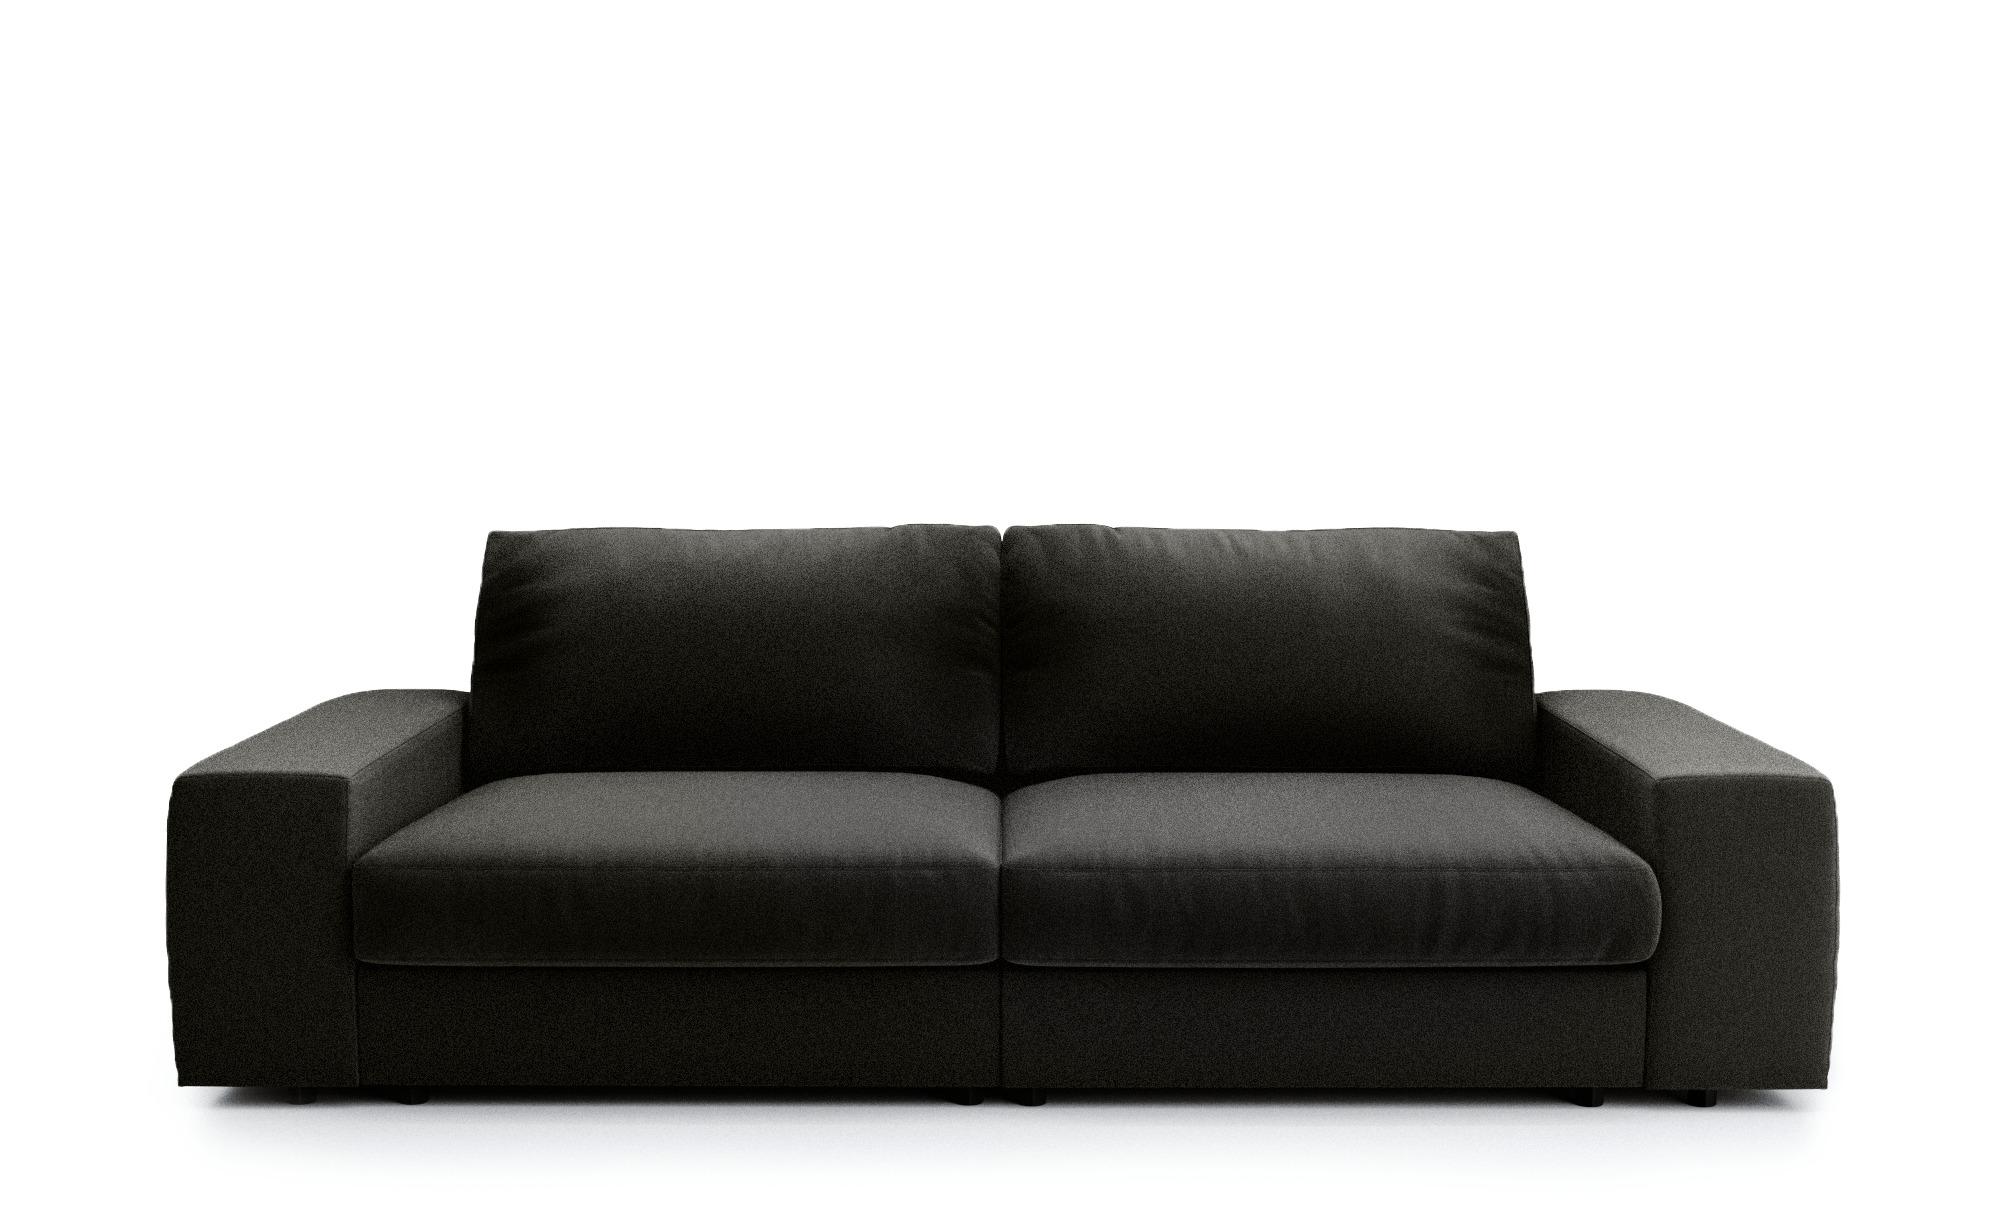 Big Sofa braun - Flachgewebe Brooke ¦ braun ¦ Maße (cm): B: 262 H: 88 T: 120 Polstermöbel > Sofas > Big-Sofas - Höffner